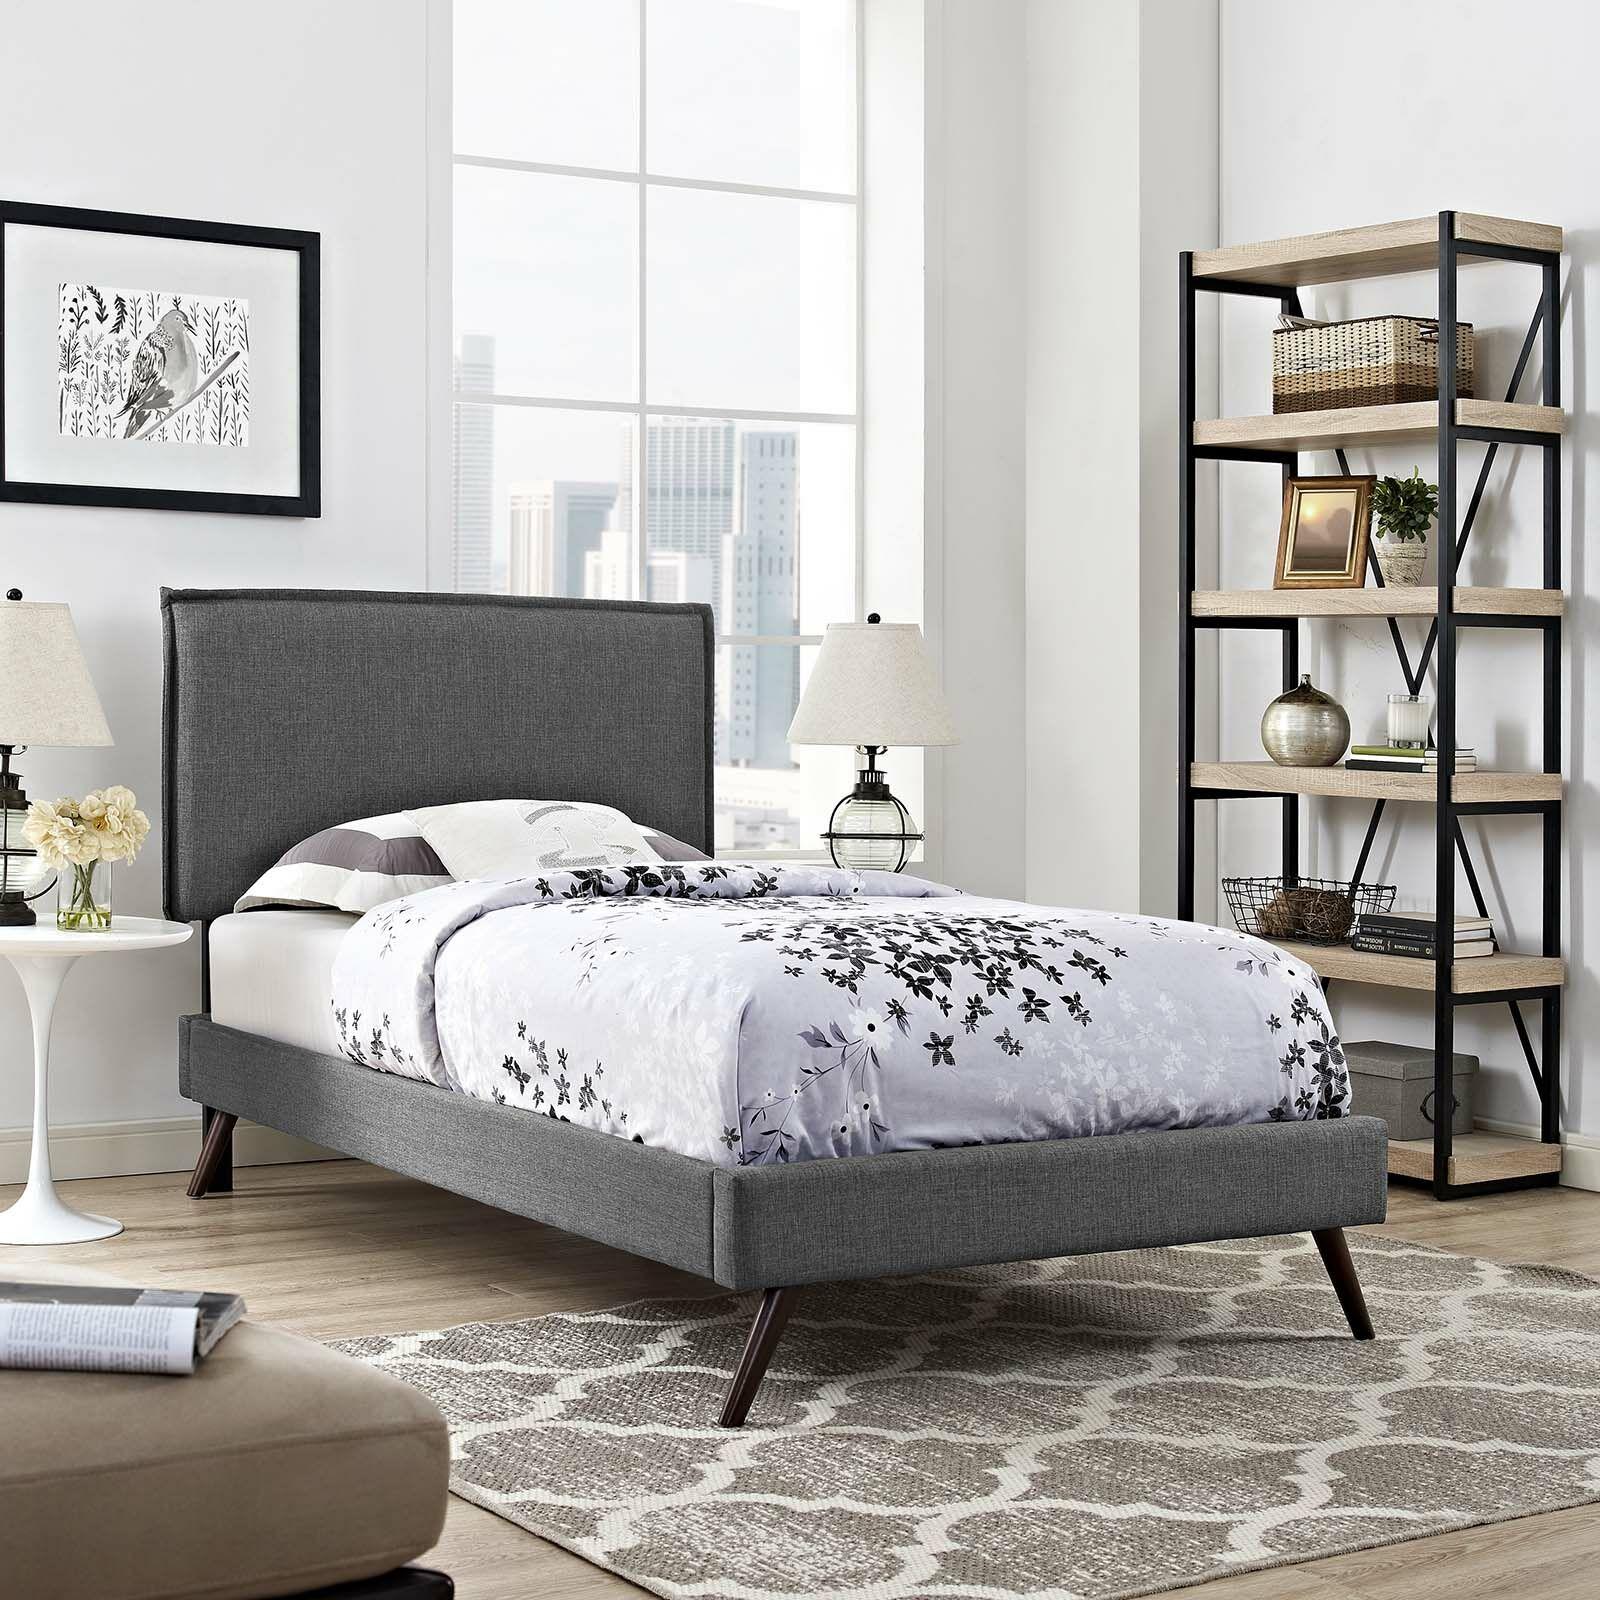 Craighead Upholstered Platform Bed Color: Gray, Size: King